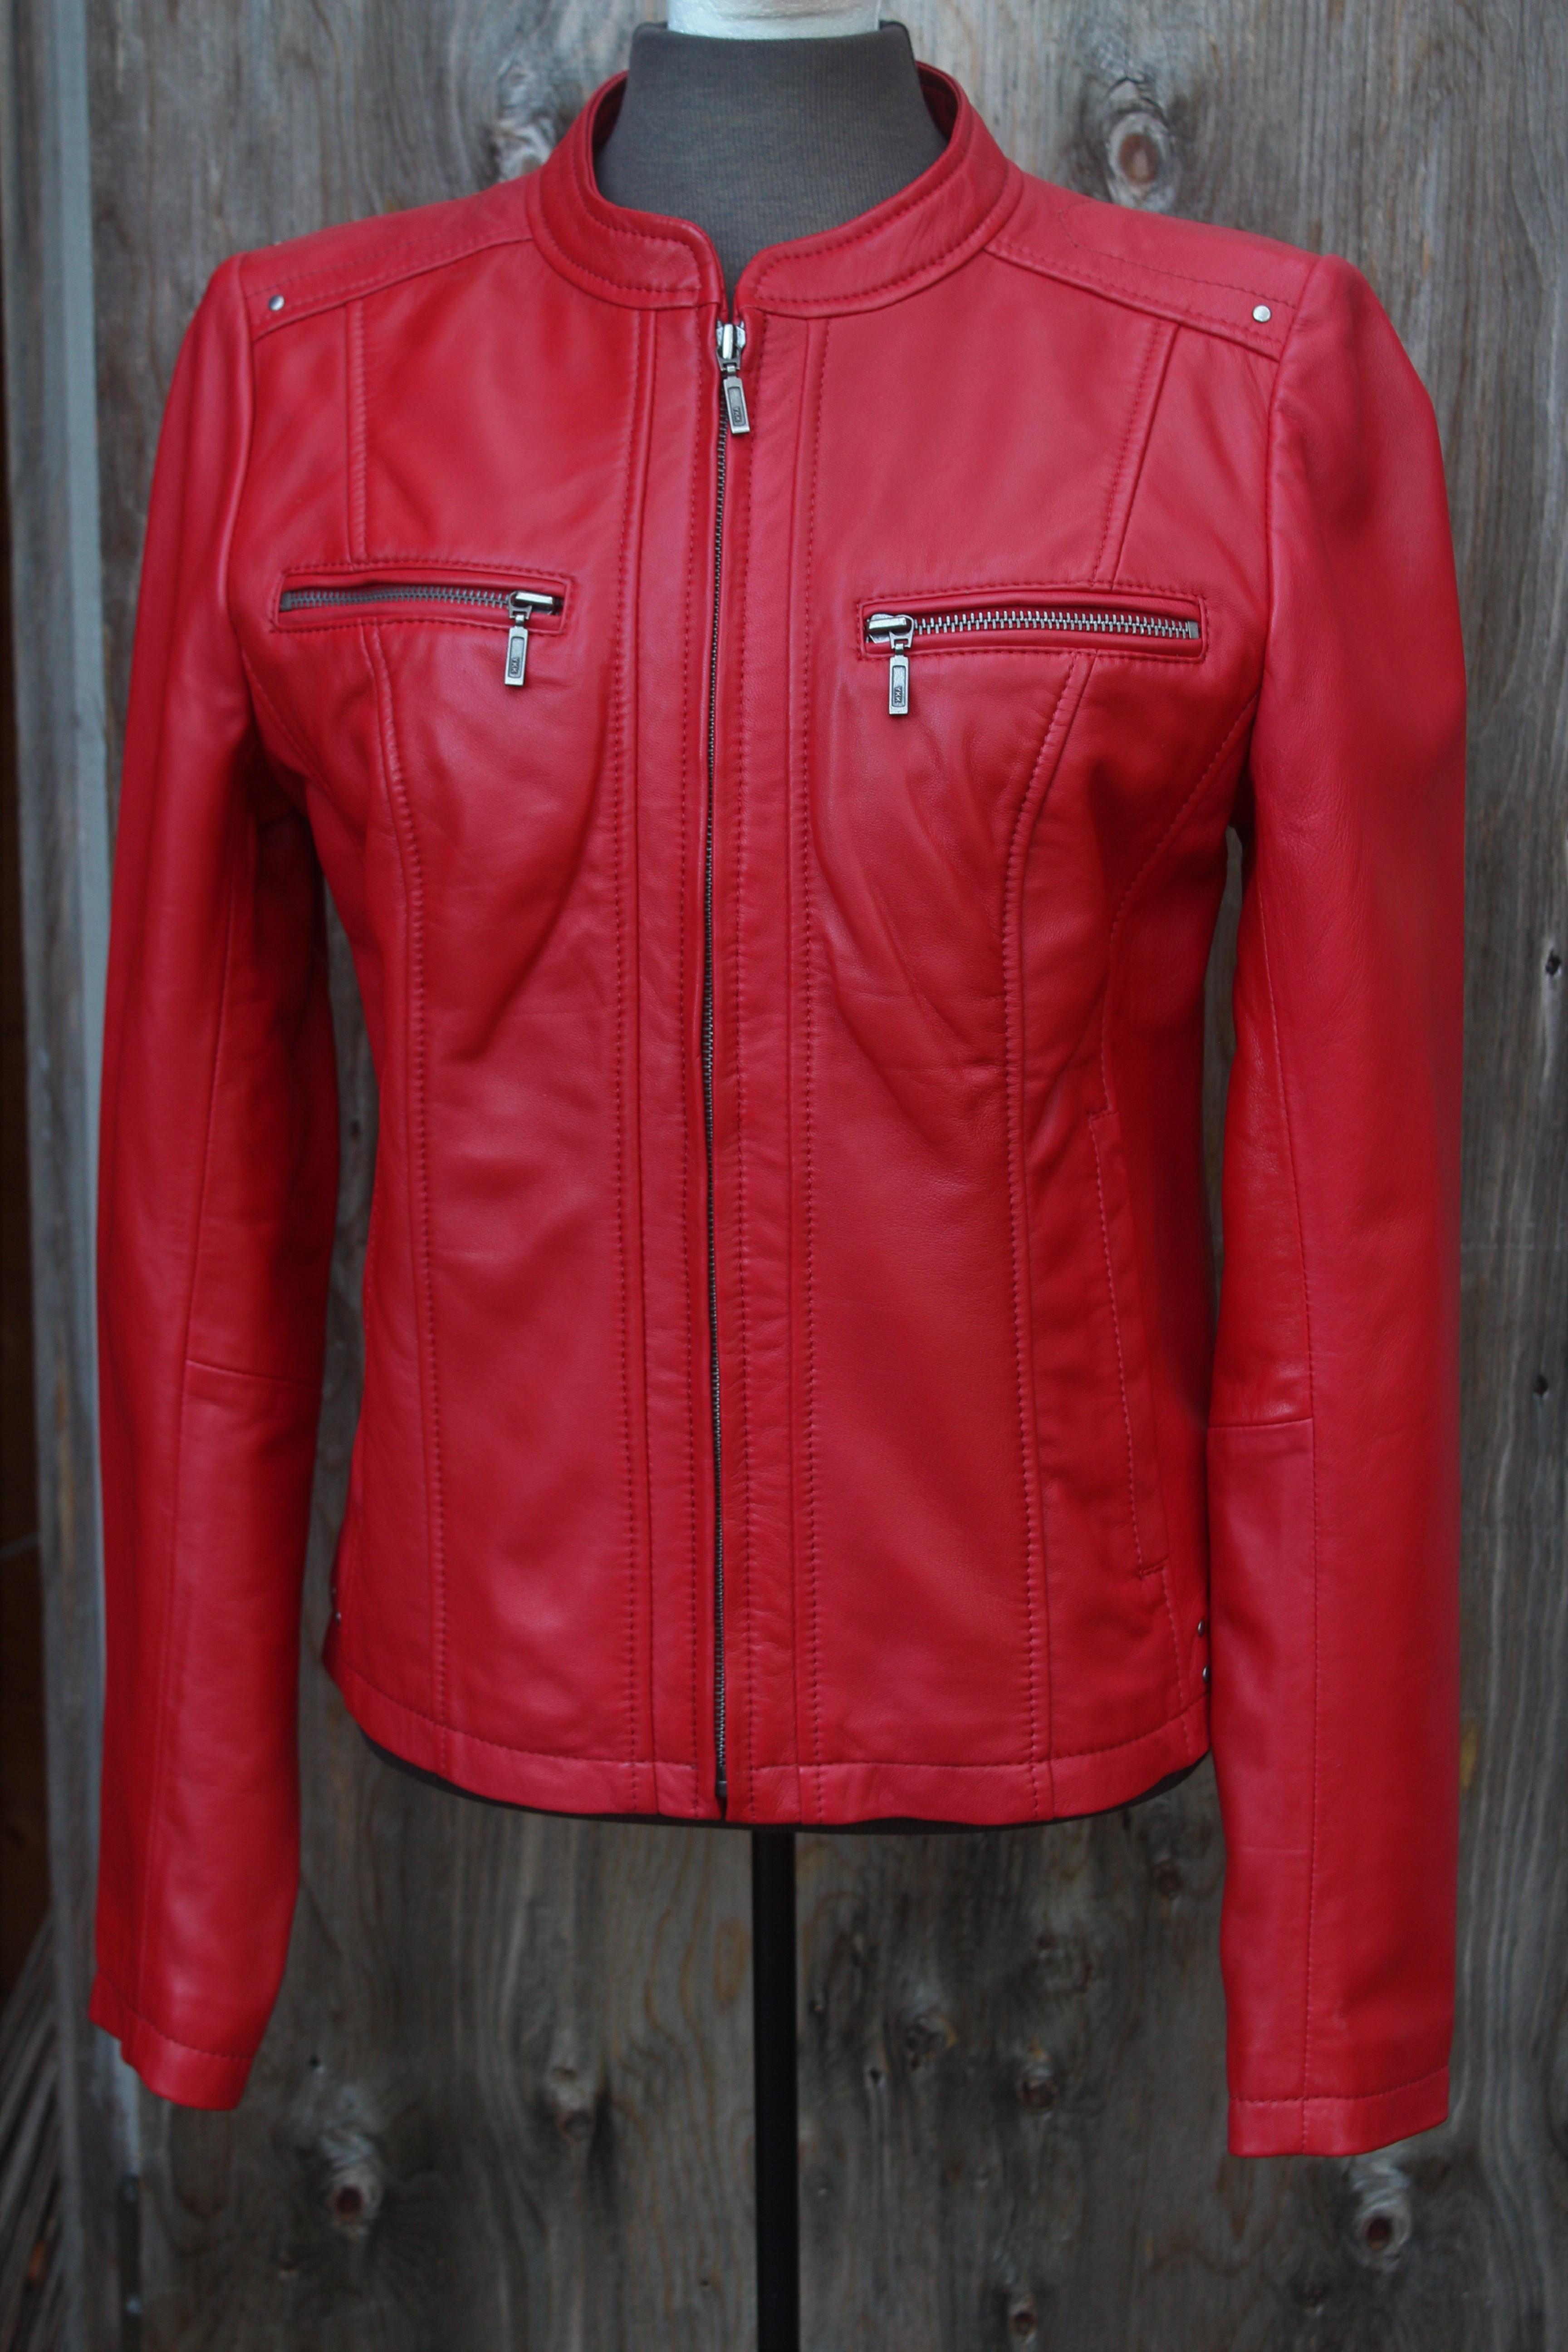 Red- $350.00 Plonge: Style #30455R